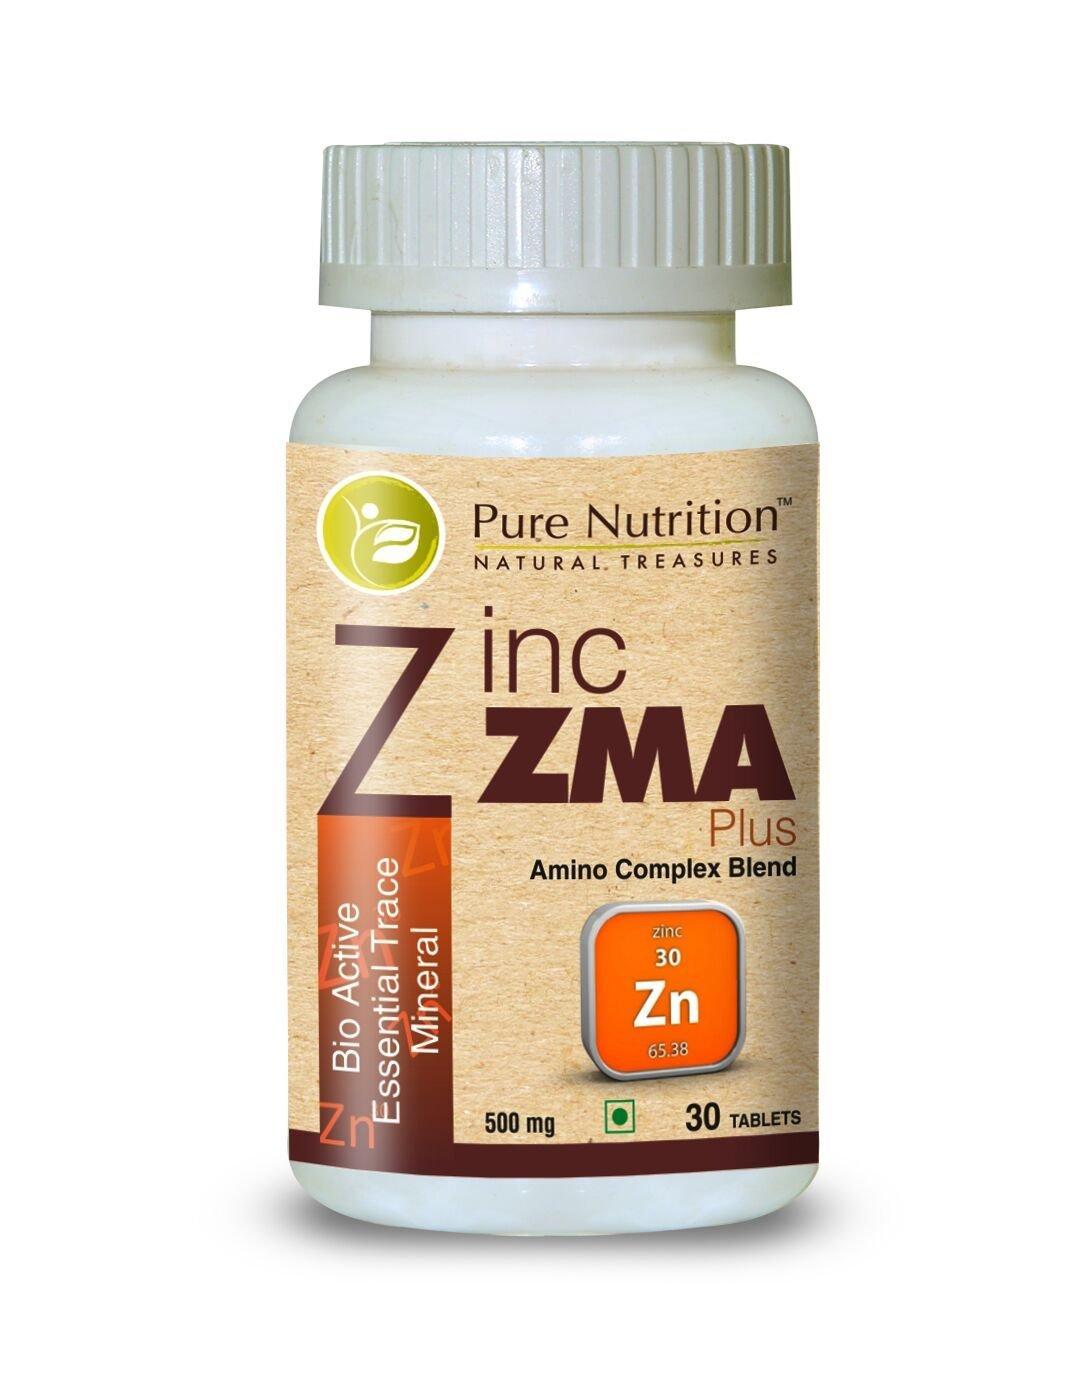 Pure Nutrition Zinc Zma Plus 720mg | Zinc Citrate + Magnesium Aspartate + Vitamin B6 | (Bio Active Essential Trace Minerals) - 30 Veg Capsules